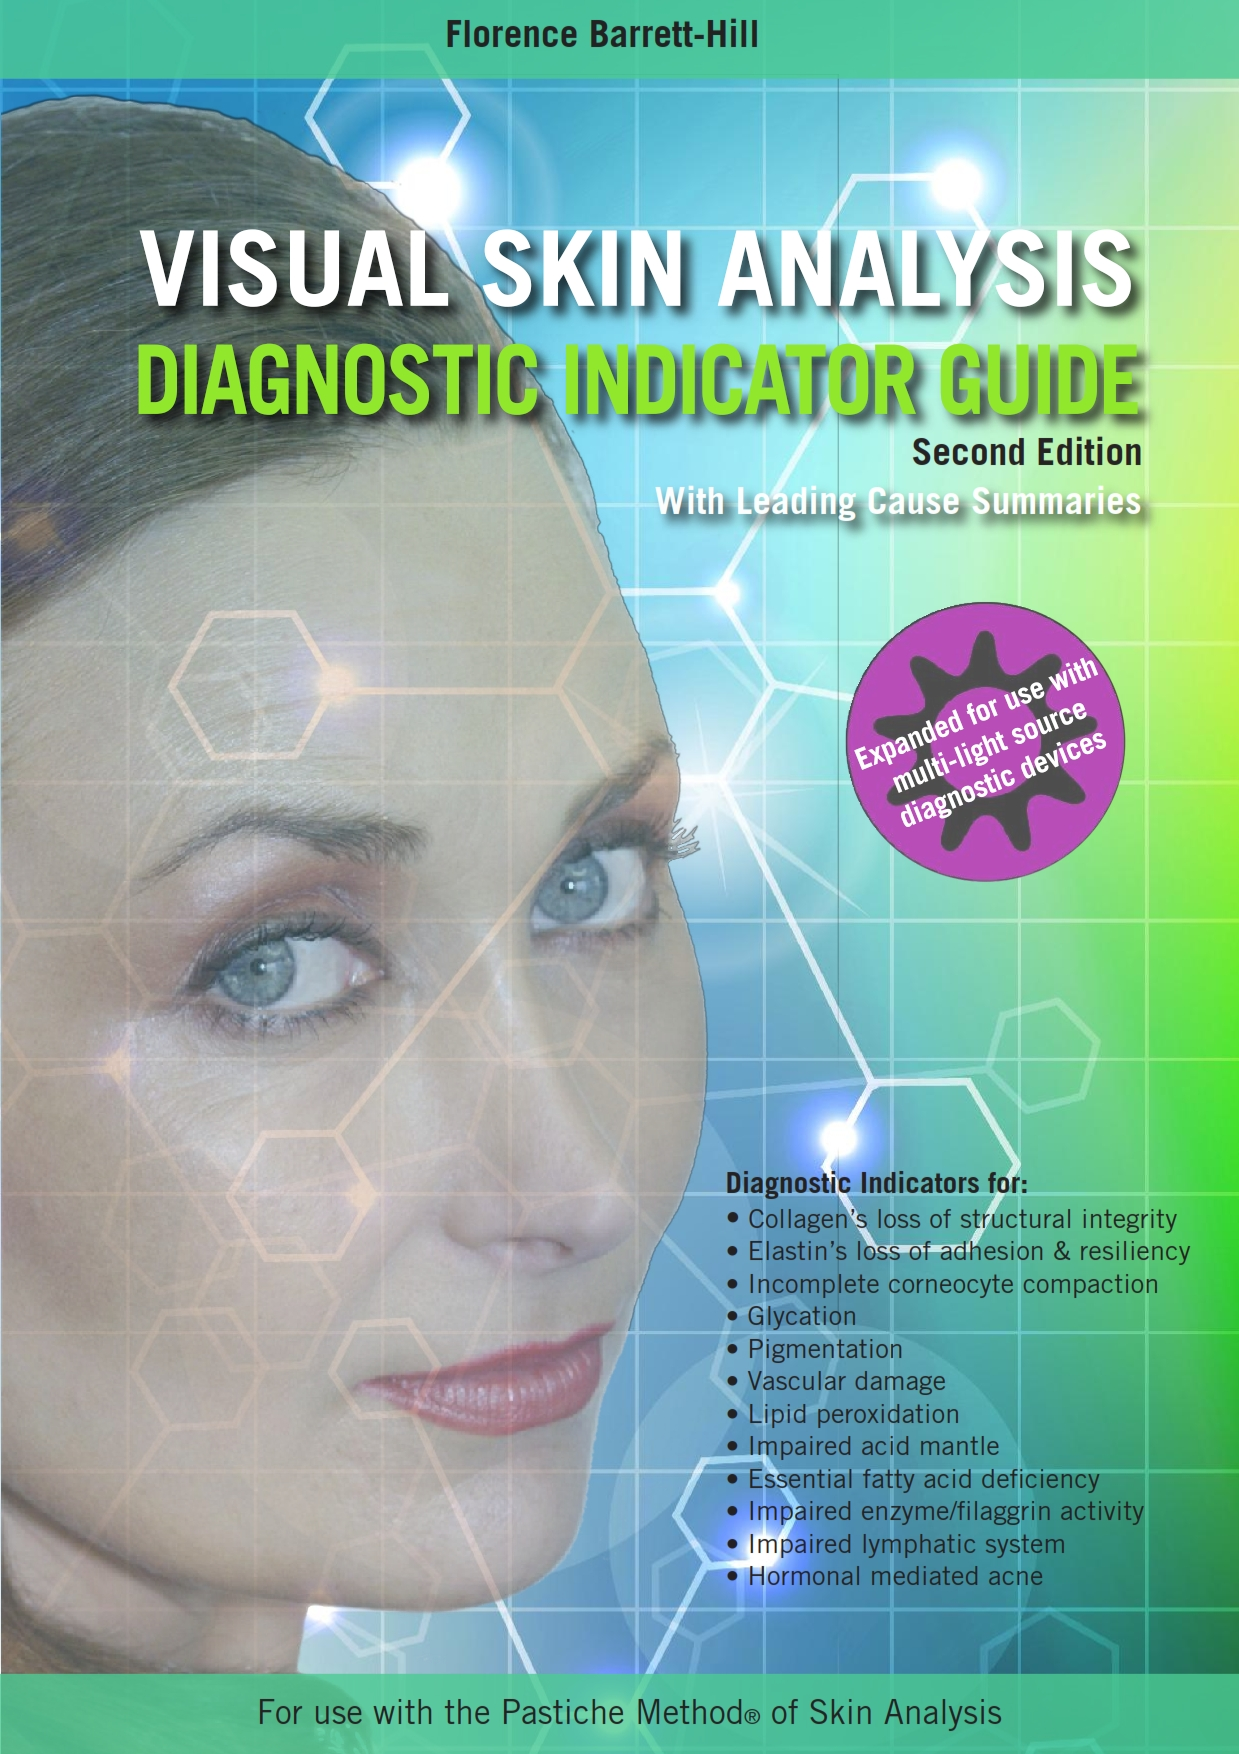 Skin analysis guide for visual analysis